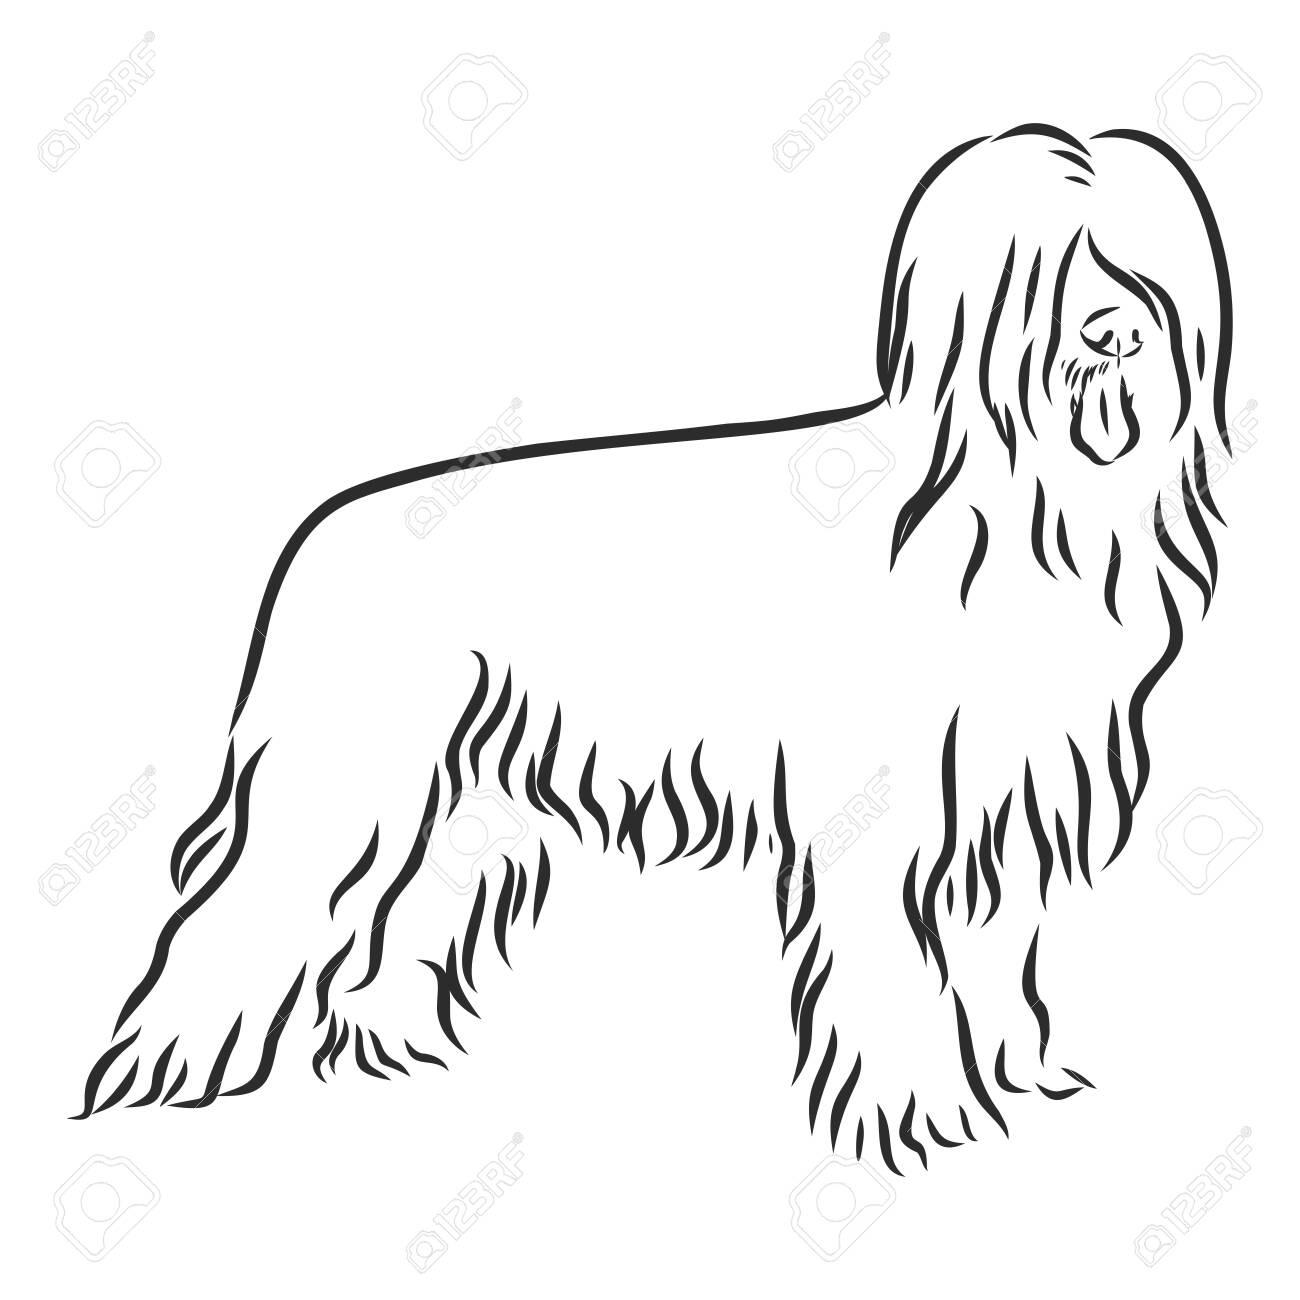 Briard French shepherd dog sketch, contour vector illustration - 136138303